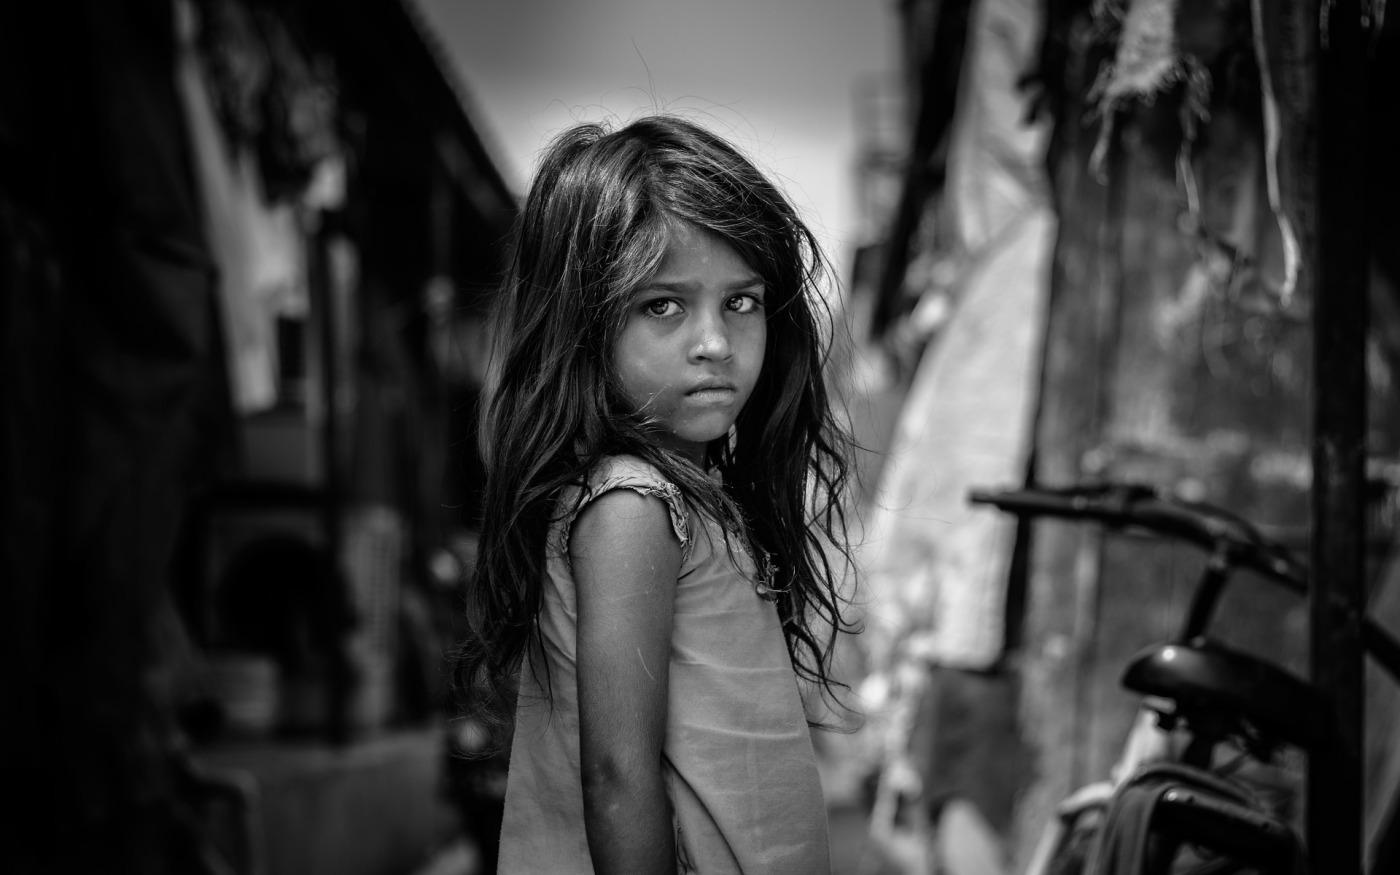 Empathy & Humanity - Topicswithpassion.blog